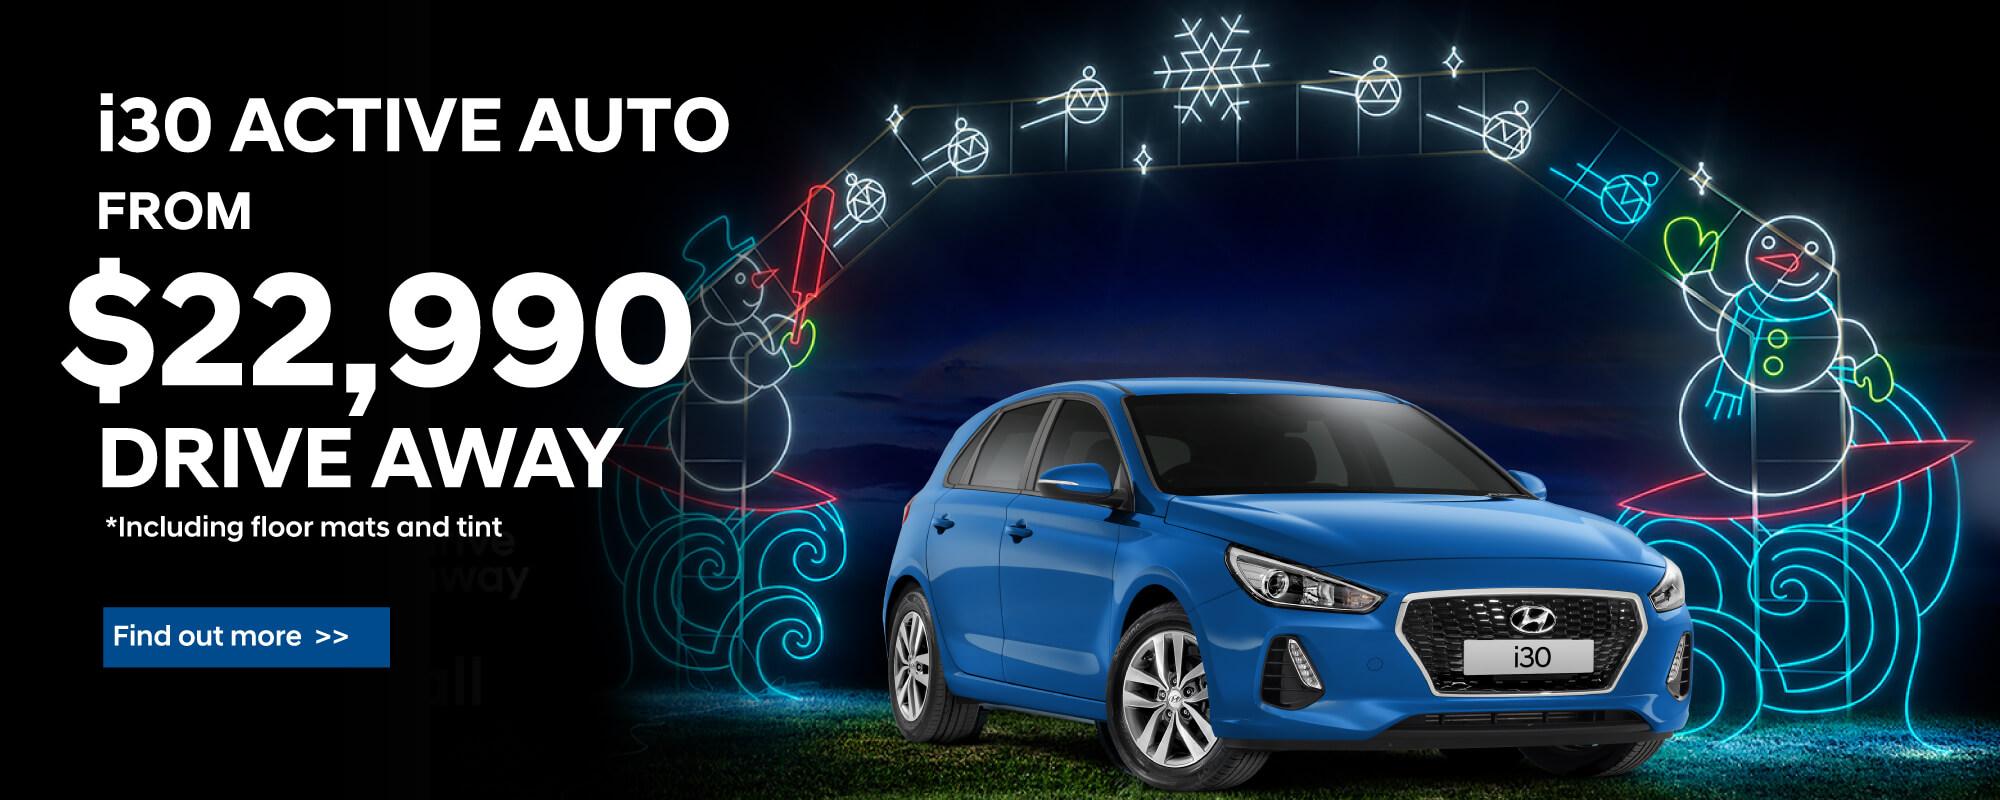 blue hyundai i30 active auto hatch